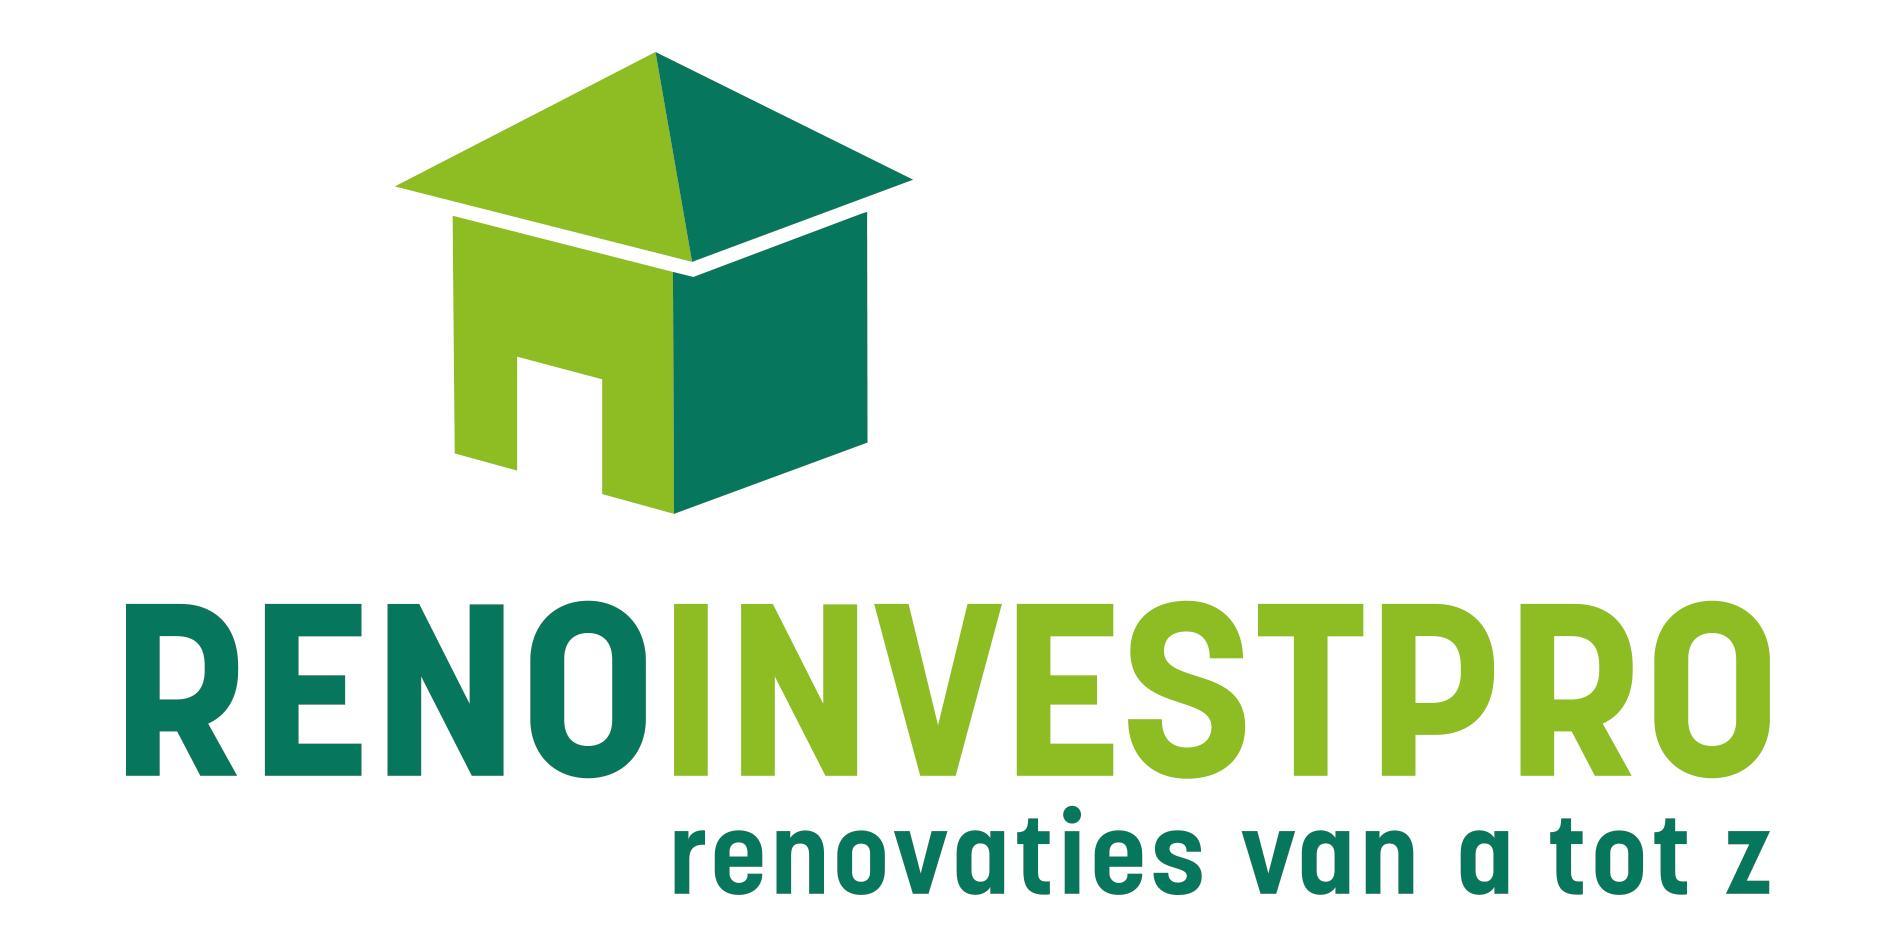 reno-invest-pro